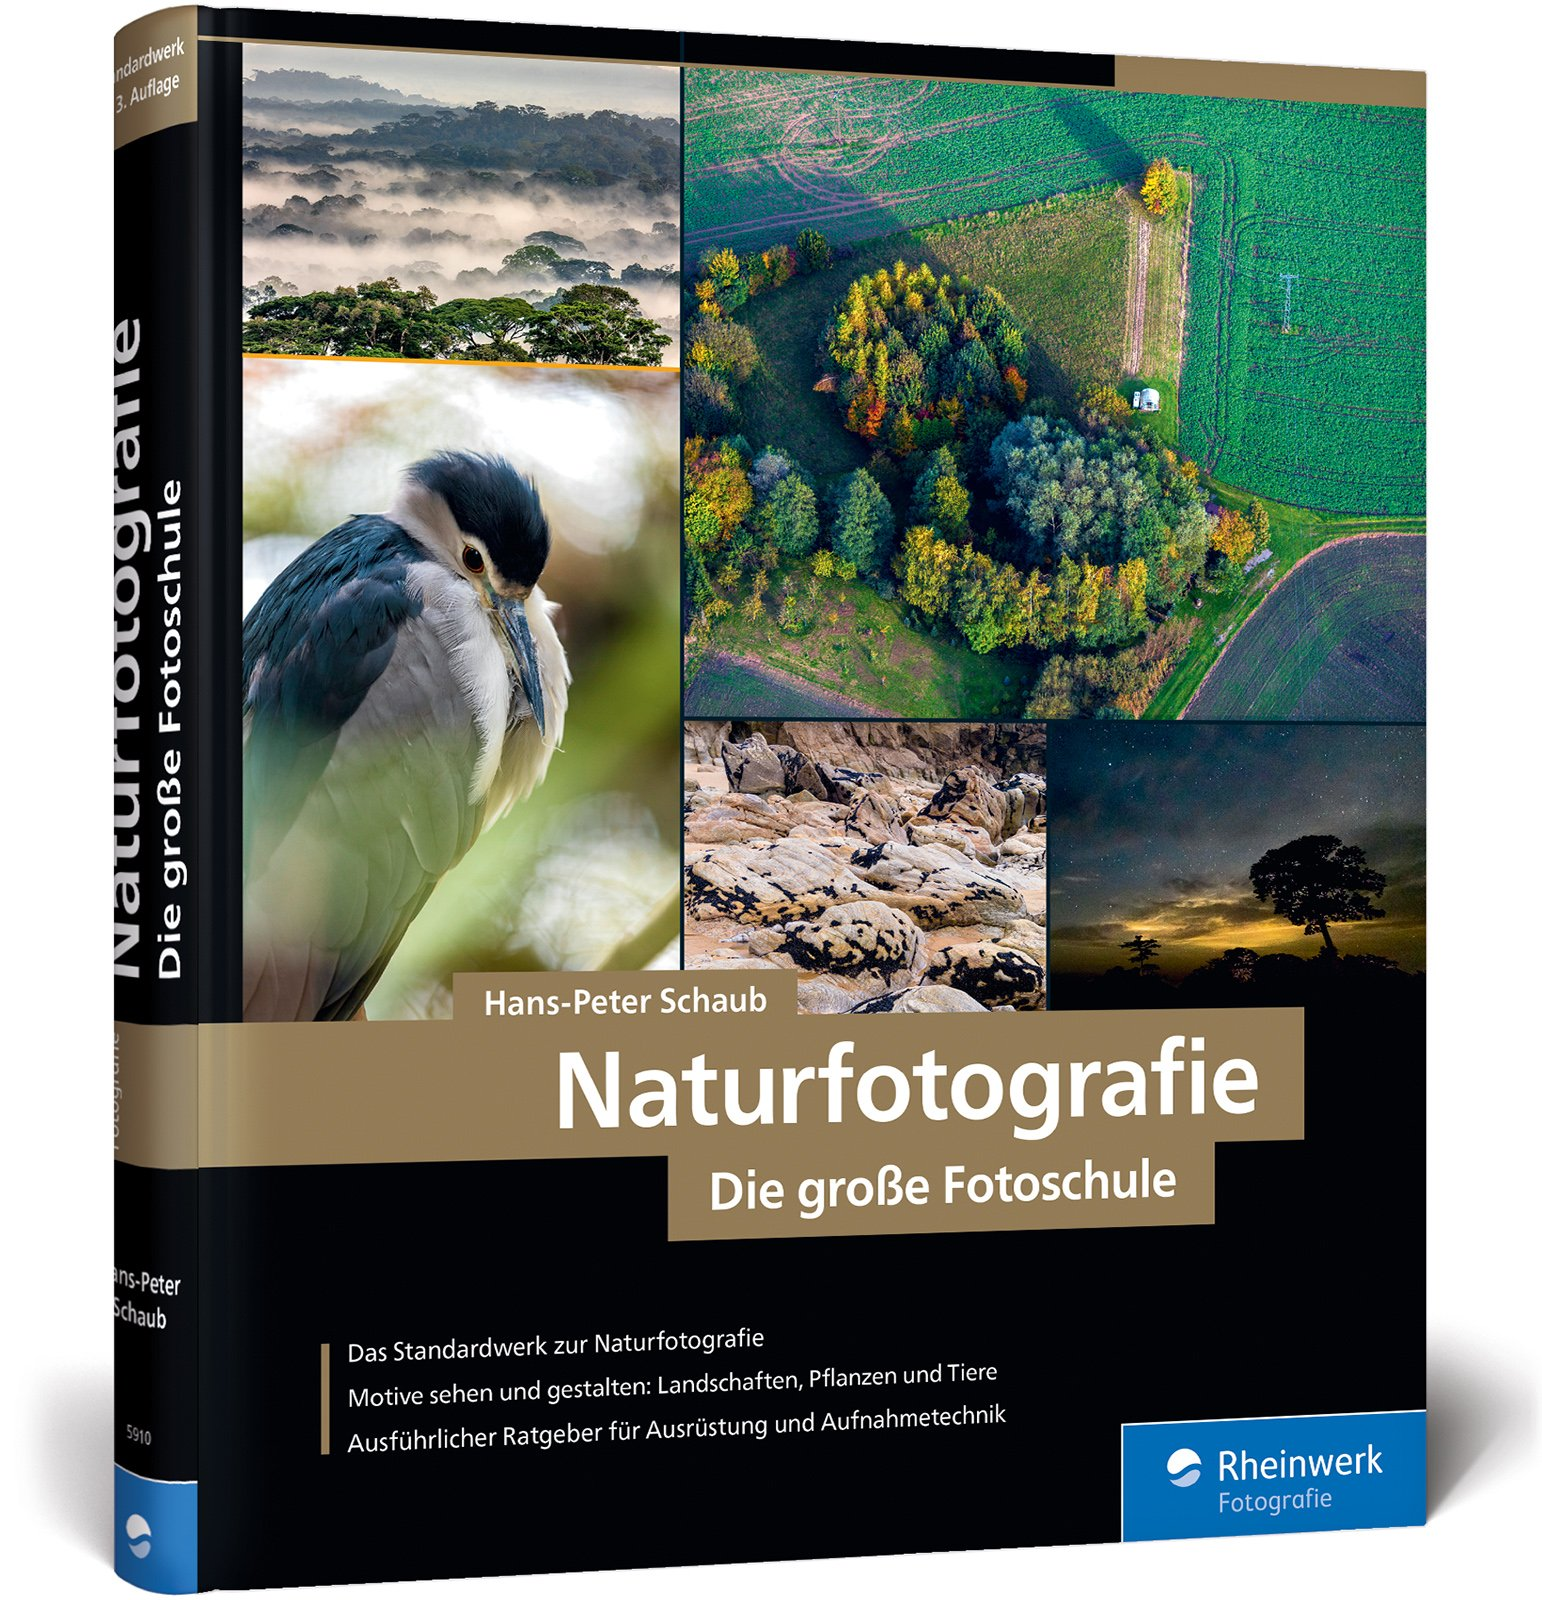 naturfotografie-die-grosse-fotoschule-natur-landschaft-makro-und-tiere-spektakulr-in-szene-setzen